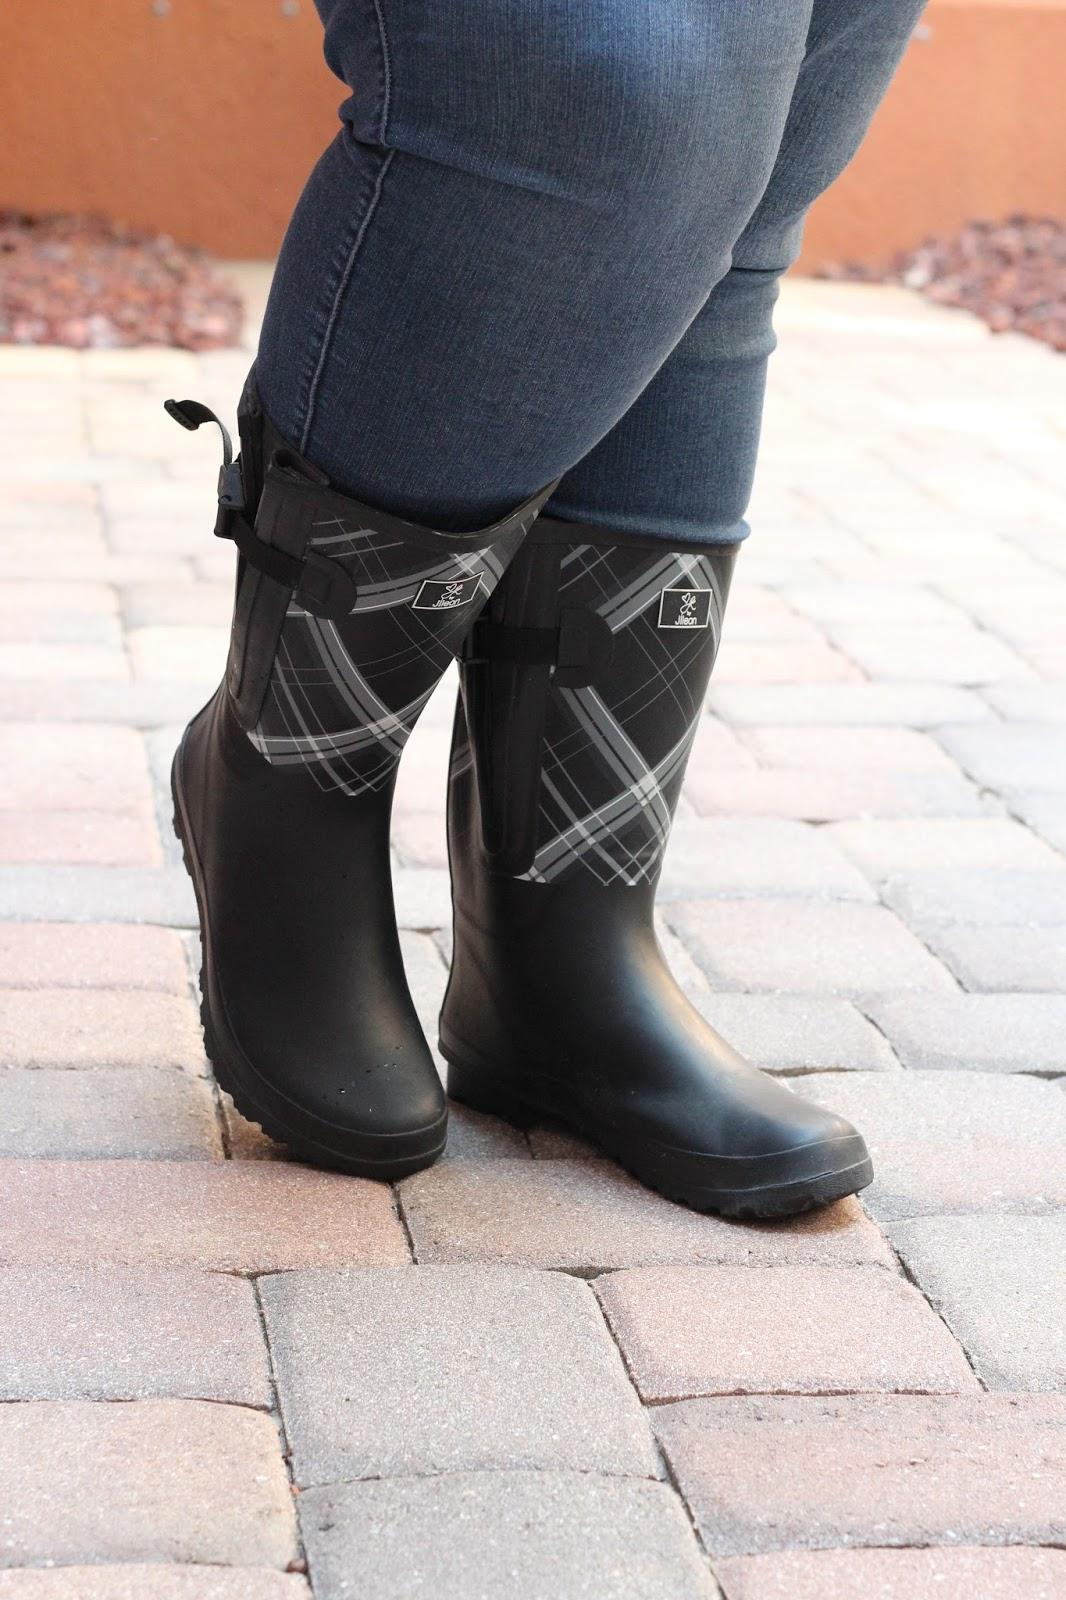 36820bb6774e Jessica Kane x Jileon Rainboots - Super Wide Calf Rain Boot - Life ...